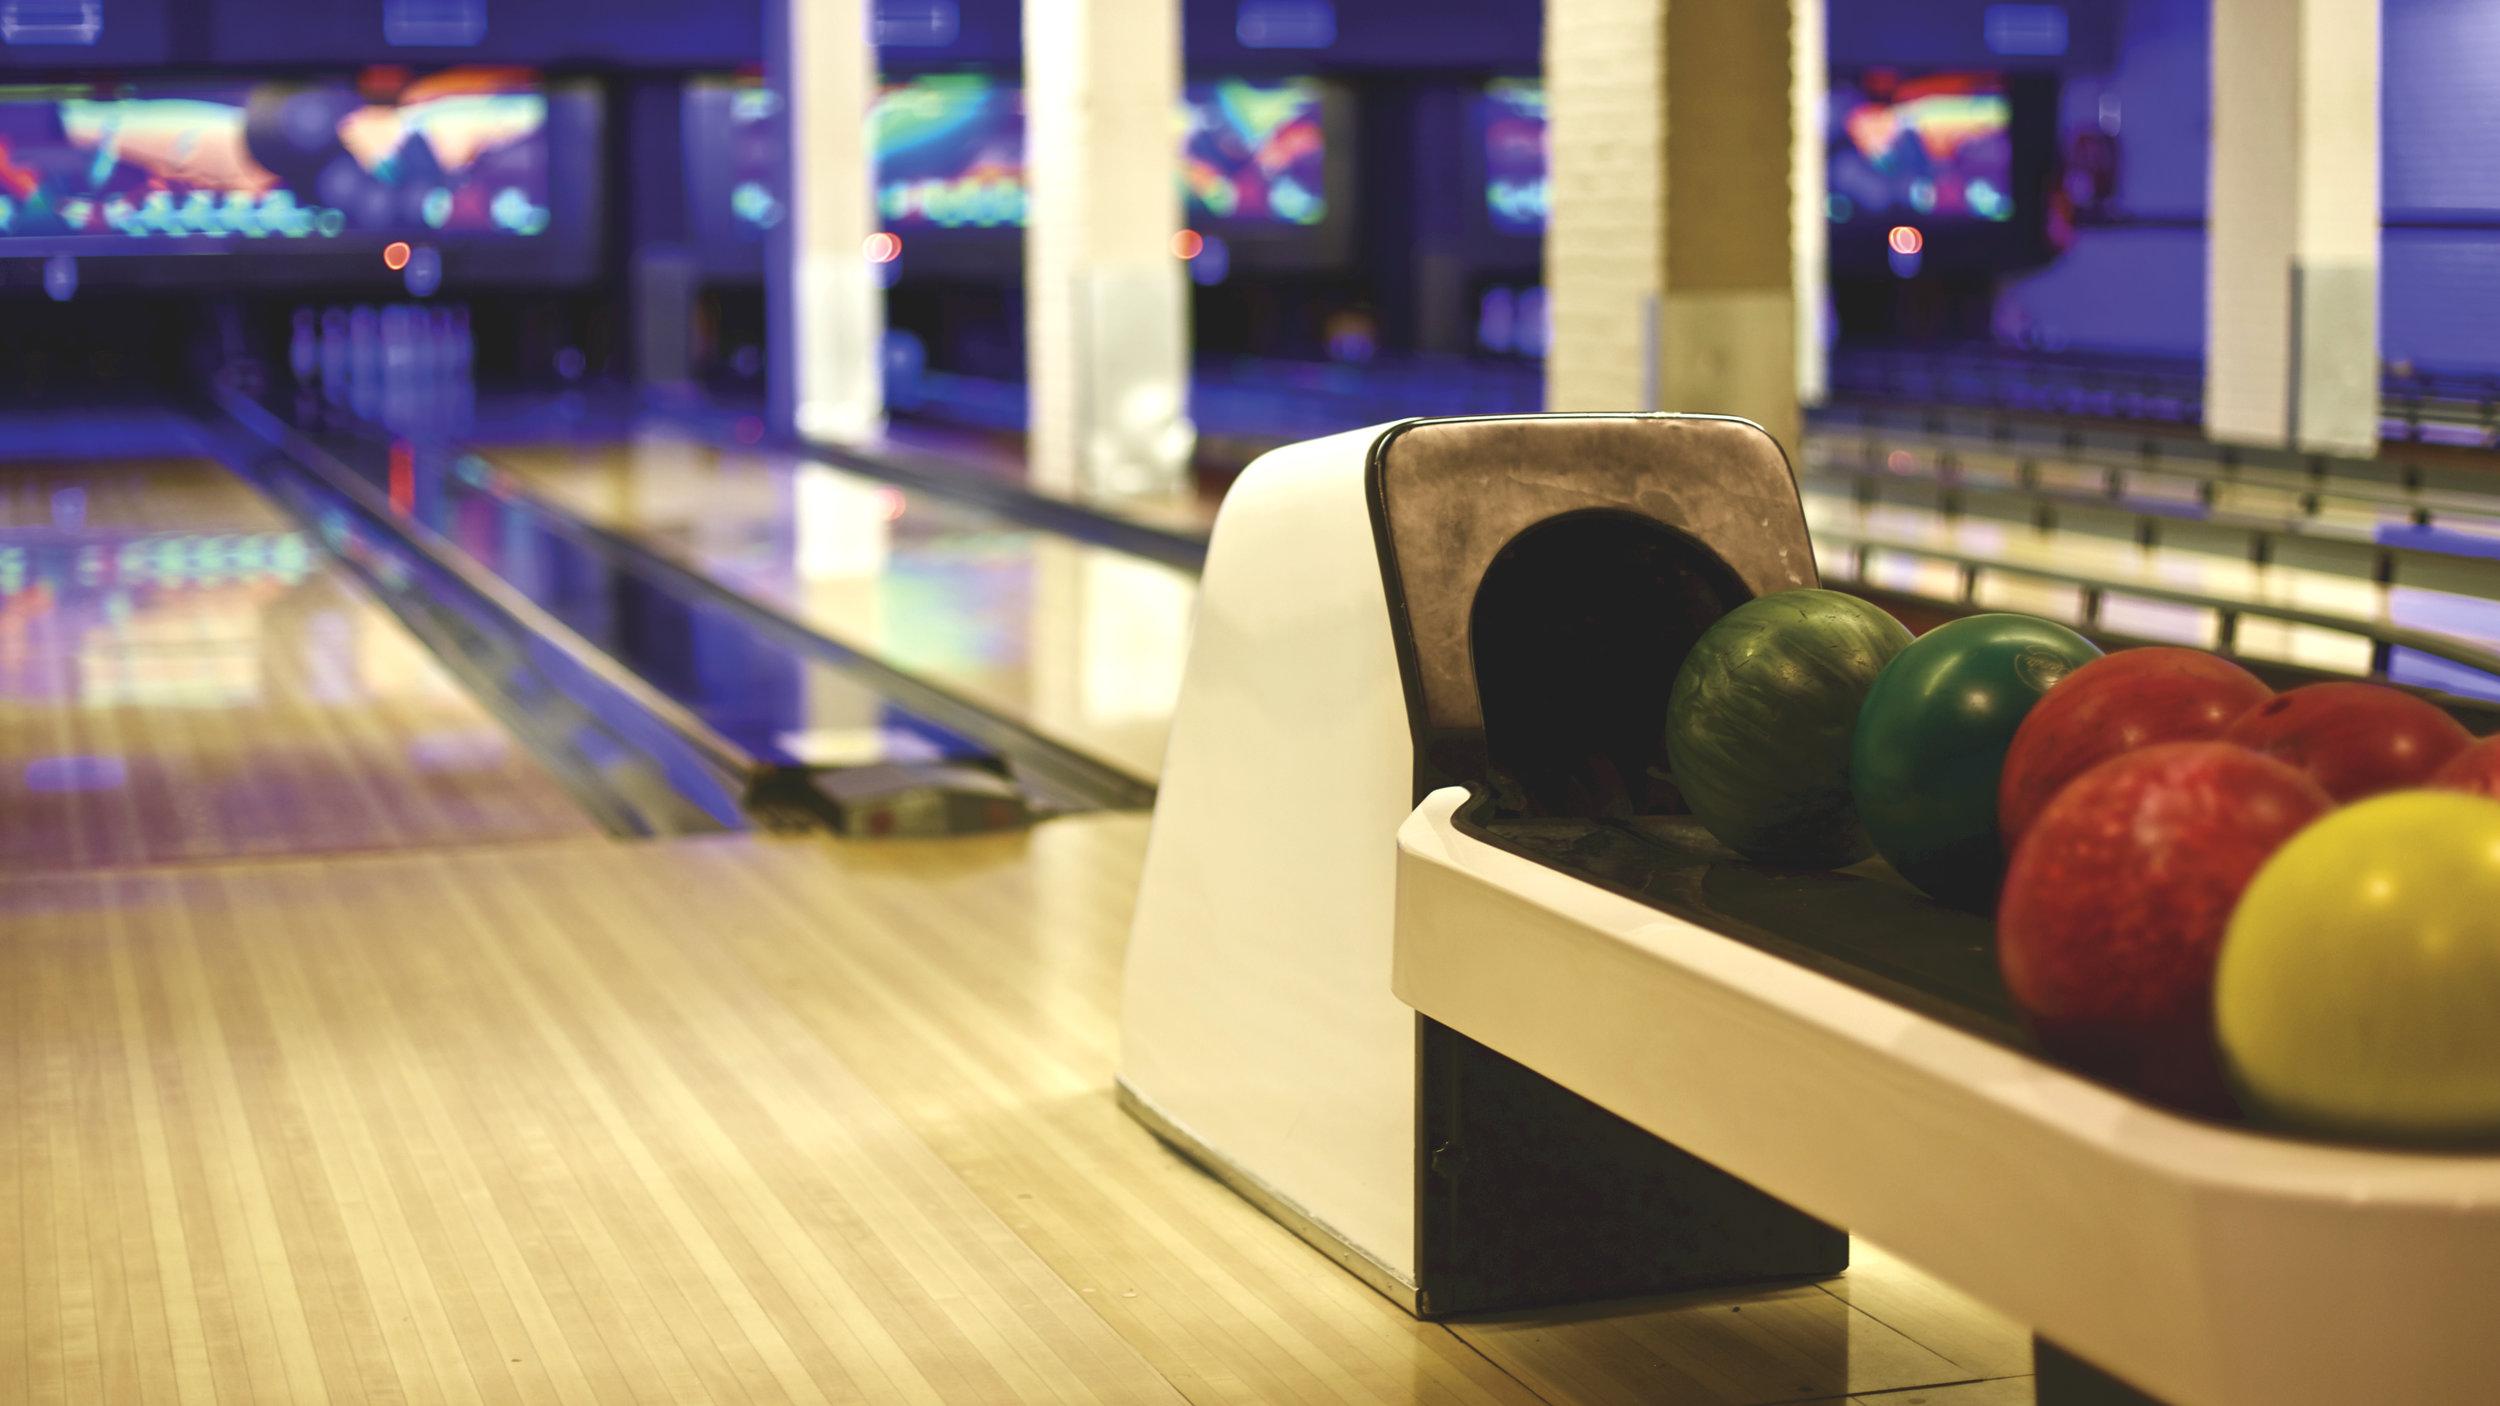 bowling alley fire sprinklers.jpeg